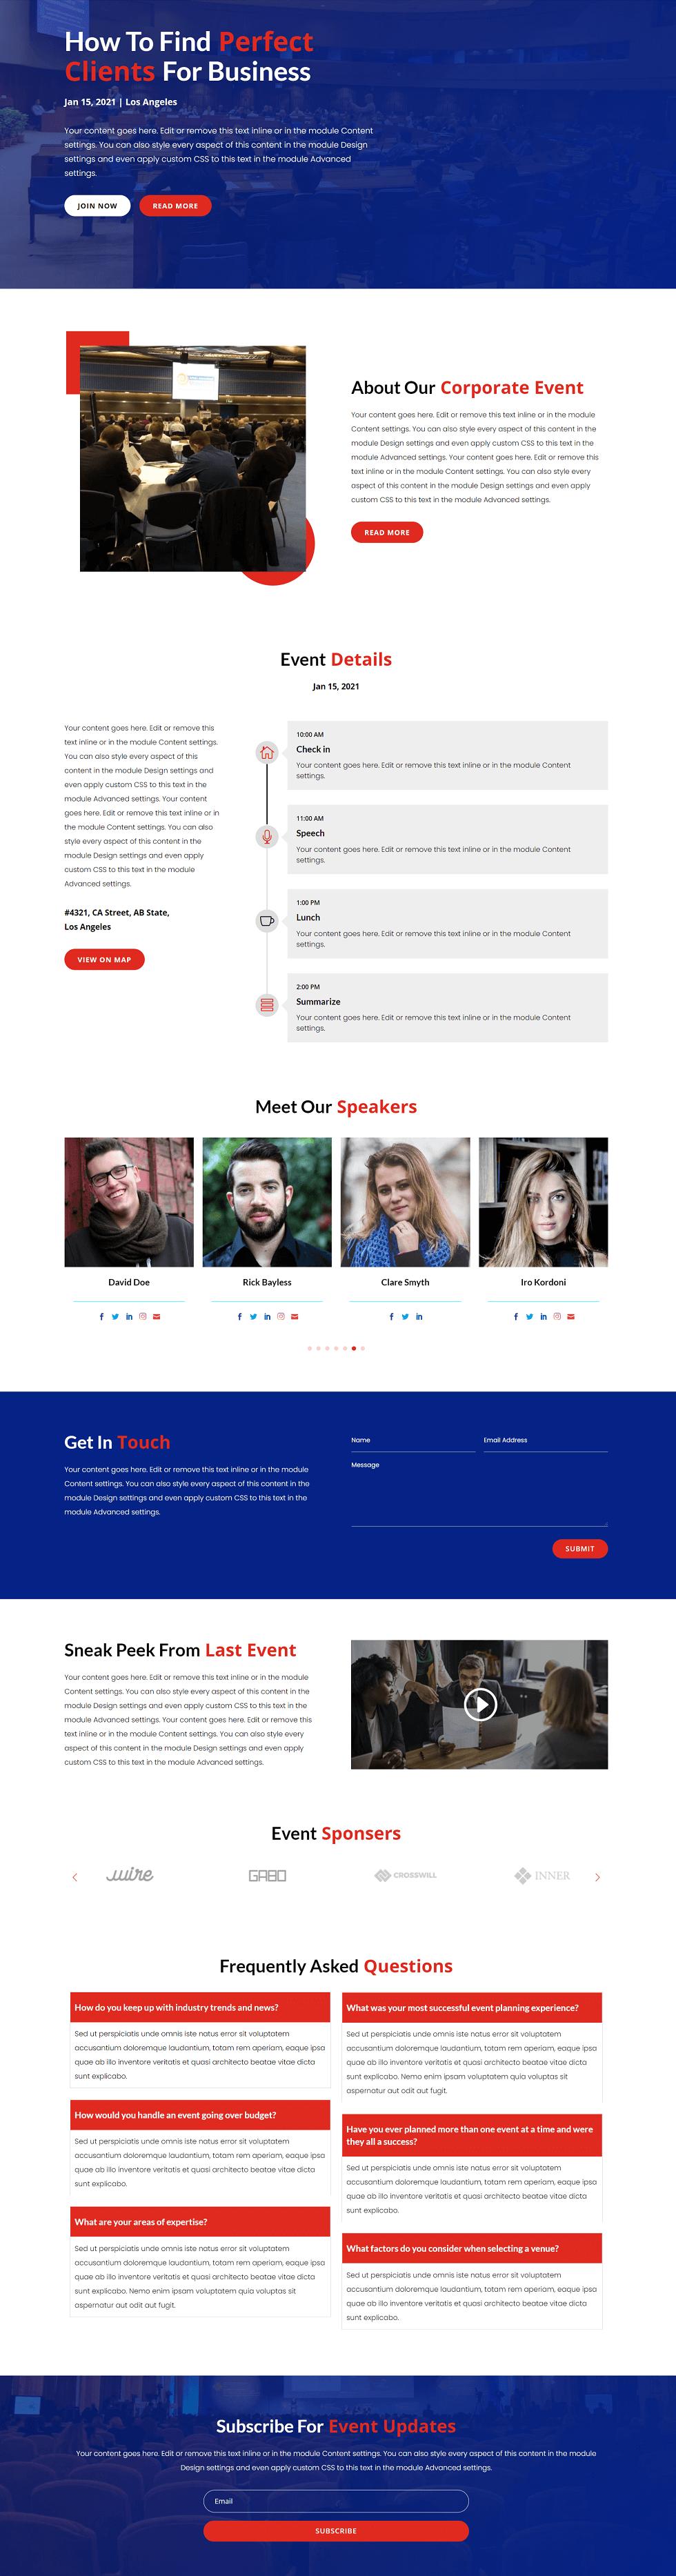 Corporate Event image